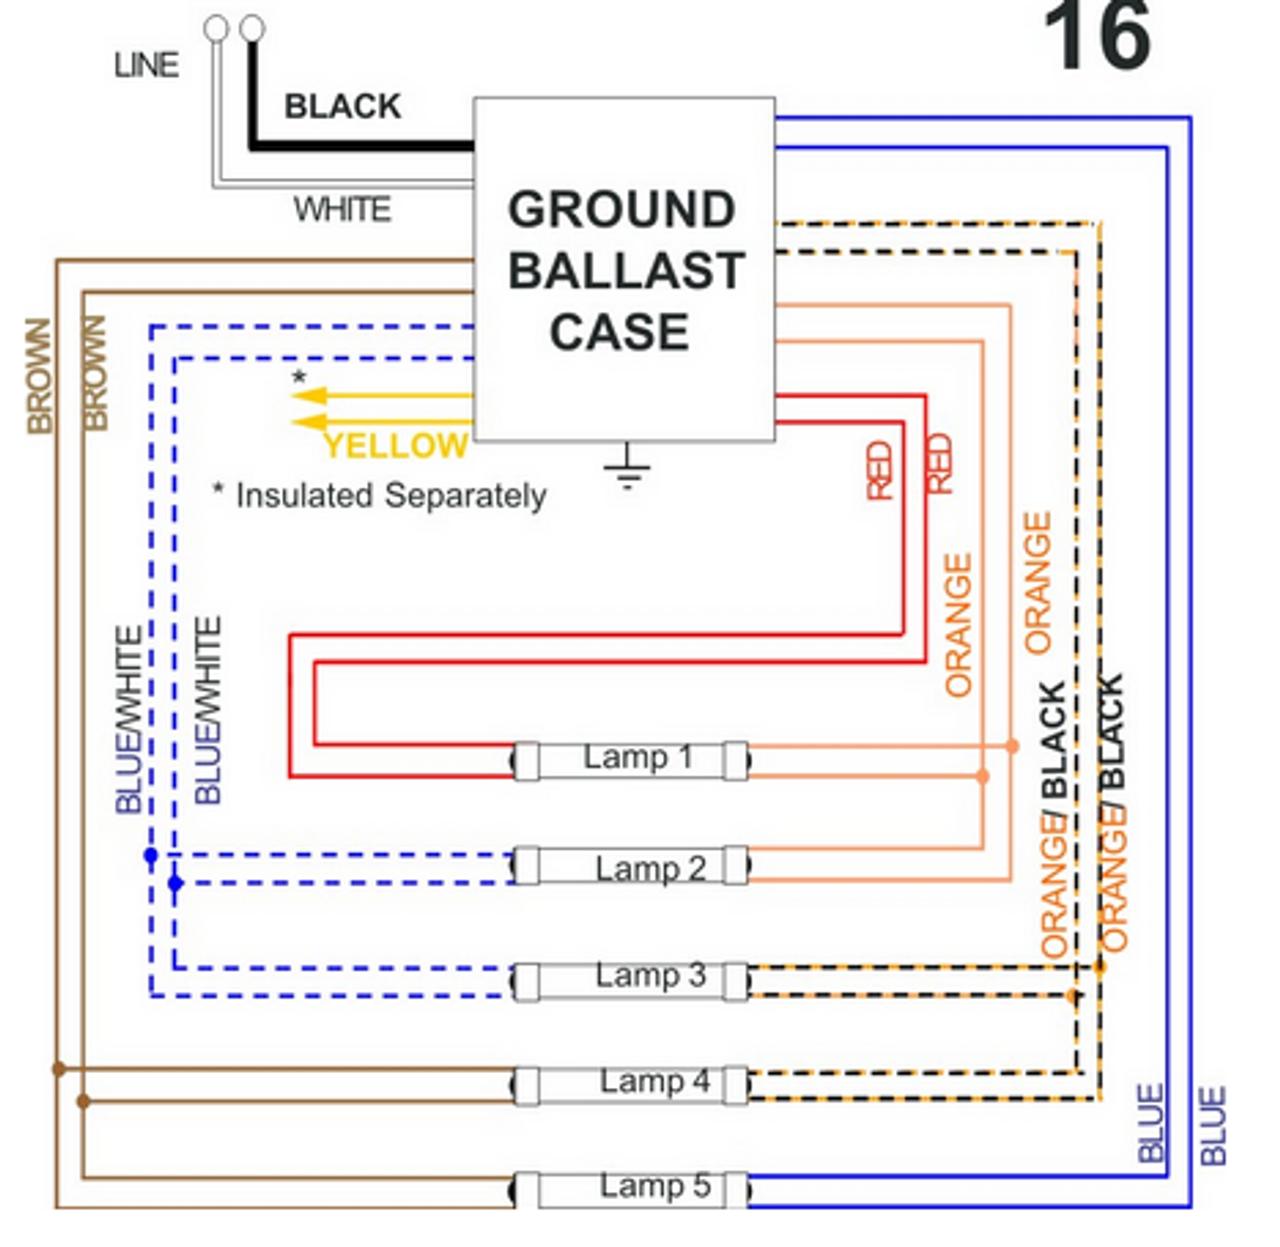 Wiring Diagram For Ballast 696. Ballast Control Panel, Ballast Cross on fluorescent light fixture ballast wiring diagram, general electric ballast wiring diagram, emergency ballast wiring diagram, hps ballast wiring diagram, advance ballast wiring diagram, replacement ballast wiring diagram, instant start ballast wiring diagram, ho ballast wiring diagram, hid ballast wiring diagram, dimming ballast wiring diagram, philips ballast wiring diagram, t12 magnetic ballast wiring diagram, metal halide ballast wiring diagram, multiple voltage ballast wiring diagram, sign ballast wiring diagram, bal3000 em ballast wiring diagram, allanson ballast wiring diagram, workhorse ballast wiring diagram, 240v ballast wiring diagram, high pressure sodium ballast wiring diagram,